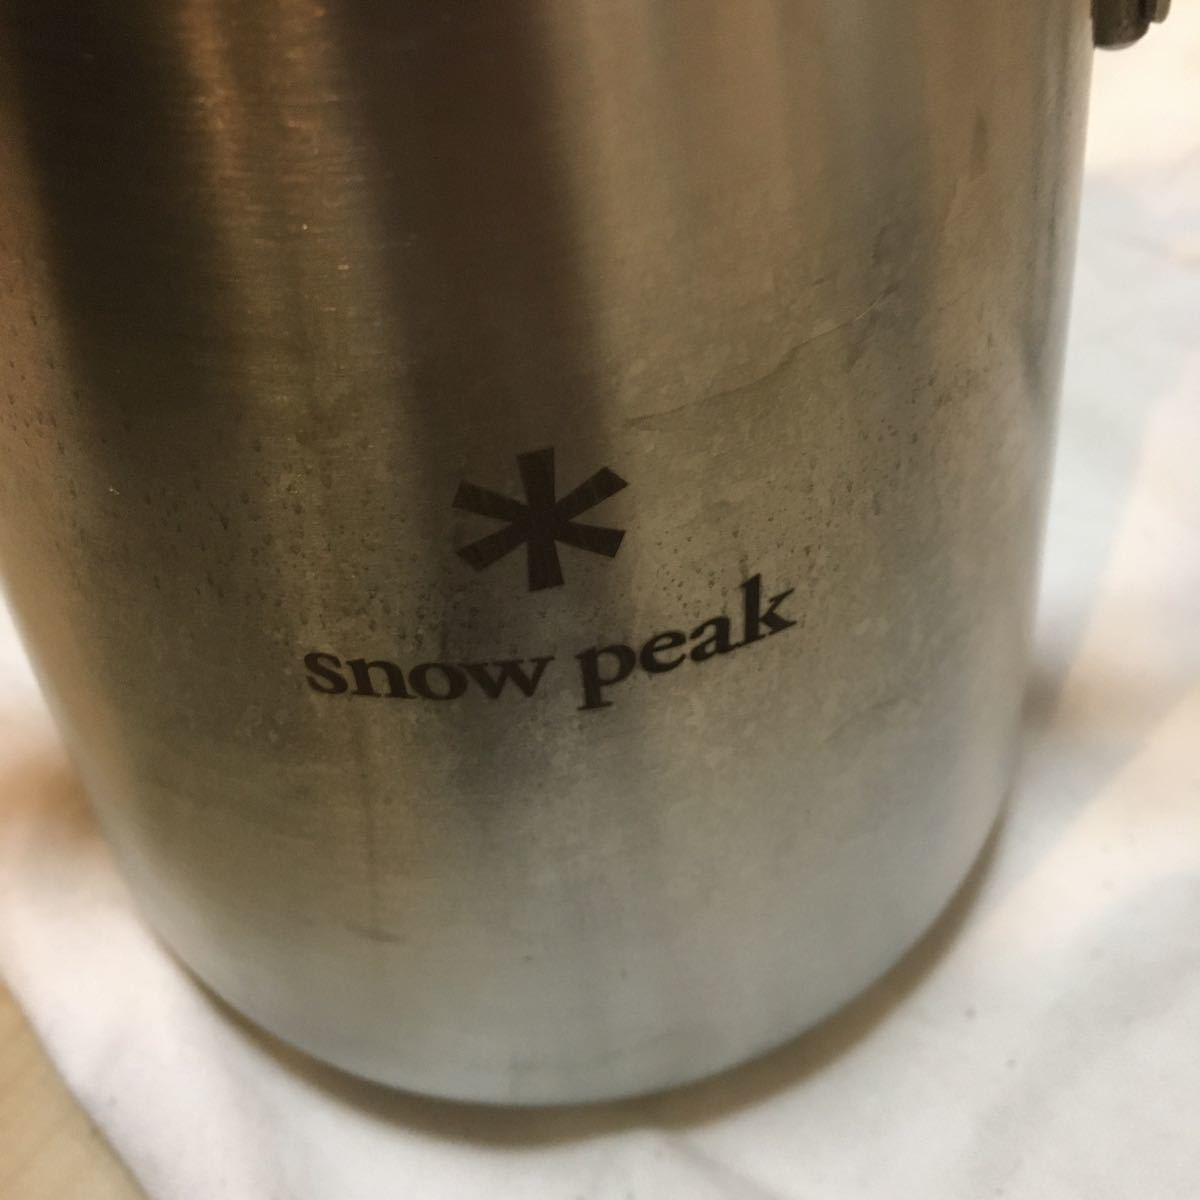 snowpeak スノーピーク  バリスタケトル コーヒードリッパー